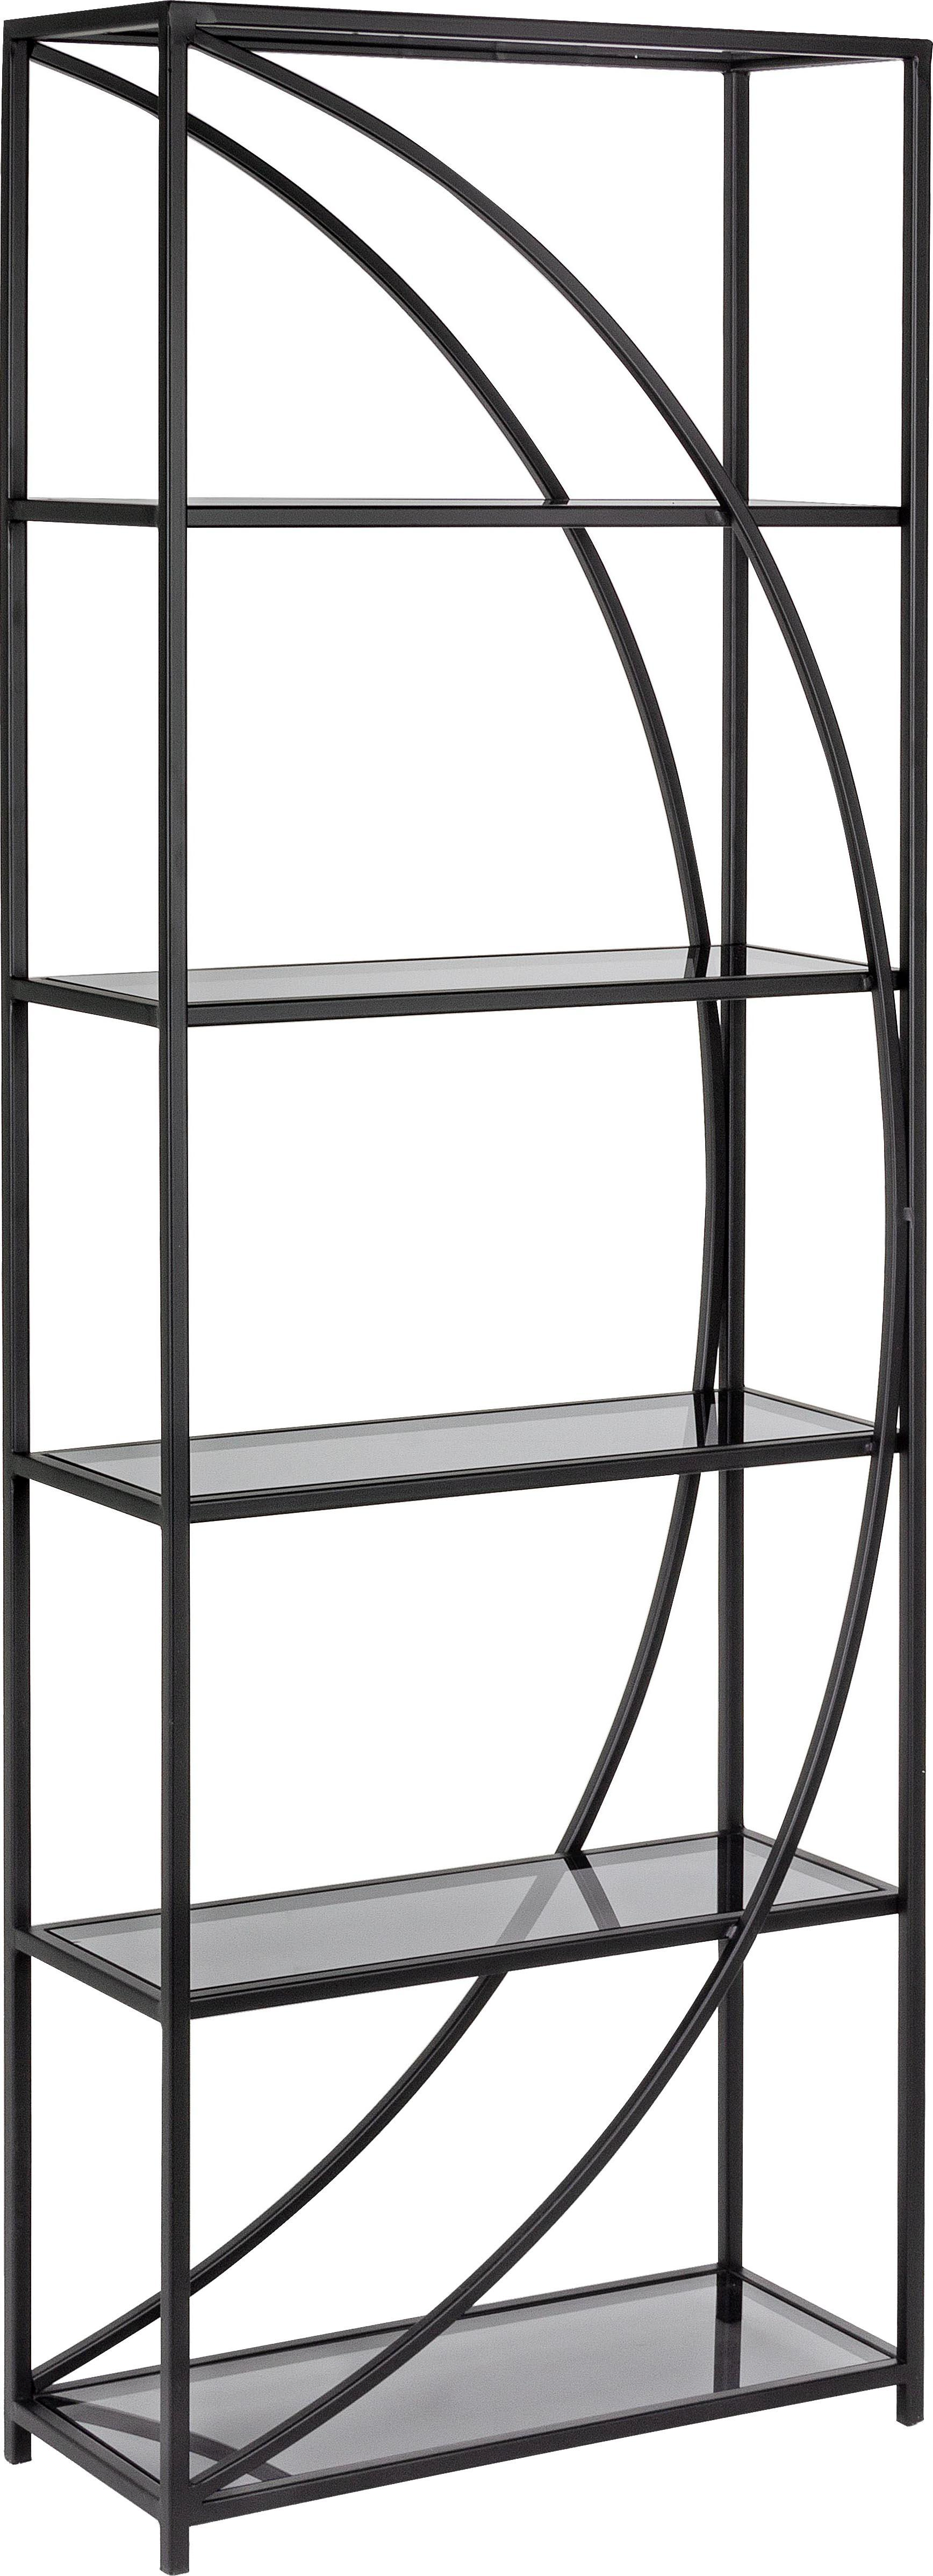 Estantería de metal Korvet, Estructura: metal epoxidado con pintu, Estantes: vidrio, Negro, gris, transparente, An 61 x Al 178 cm